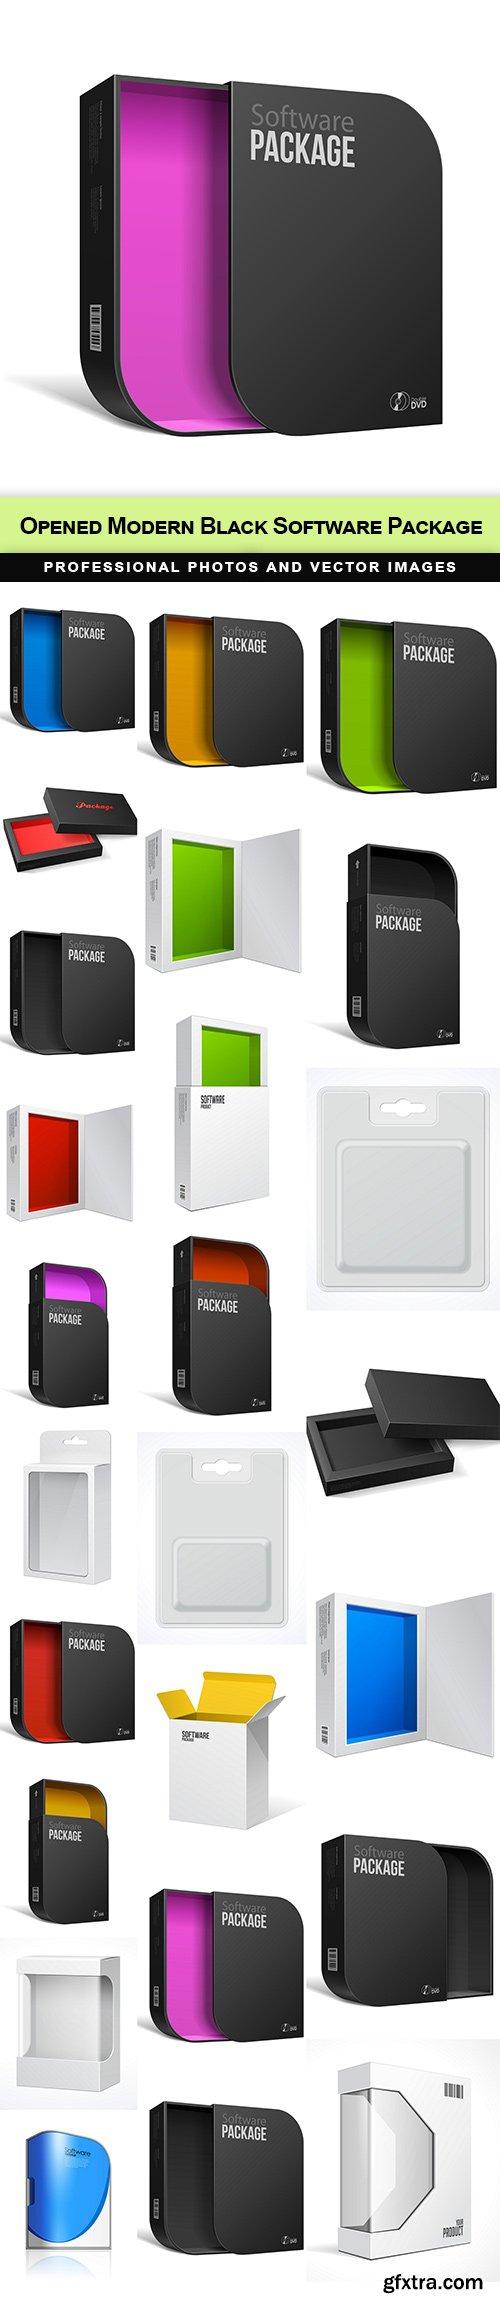 Opened Modern Black Software Package